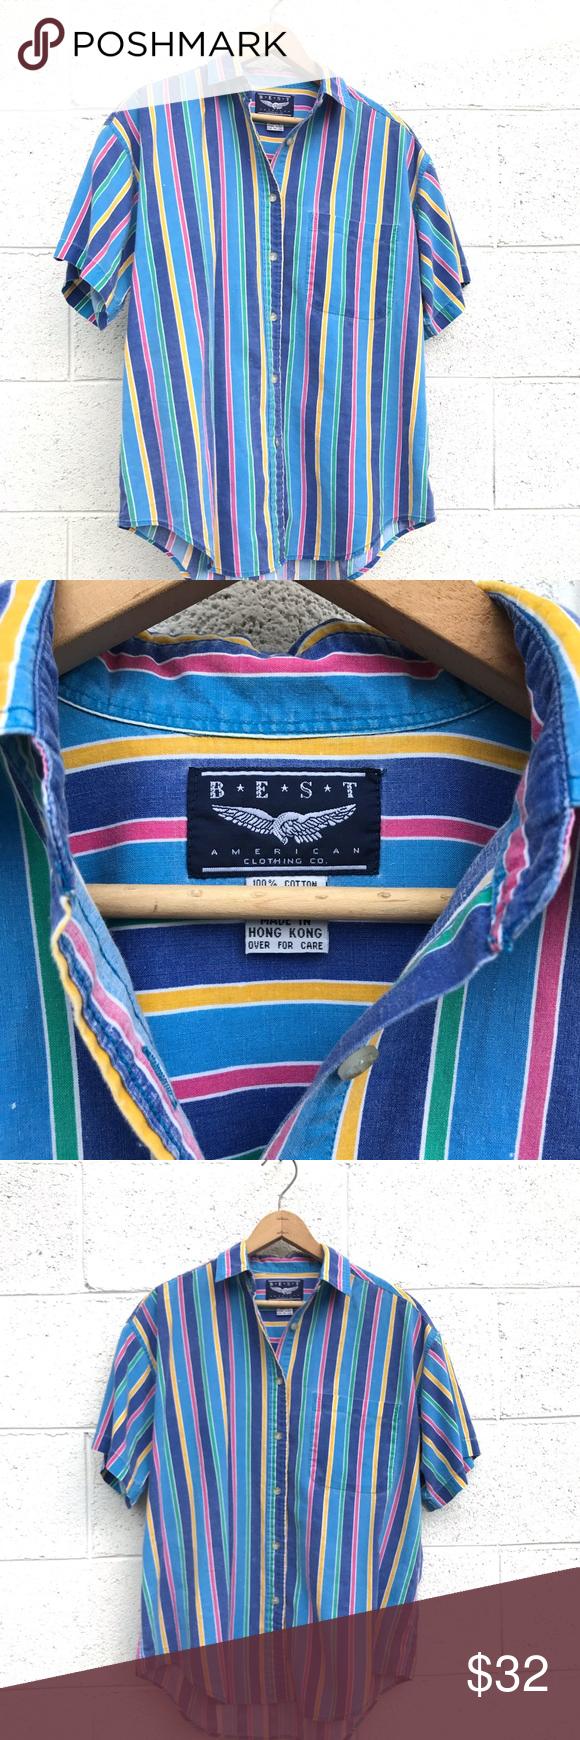 Vintage 90s Striped Button Down Shirt Vintage Shirts Clothes Design Shirts